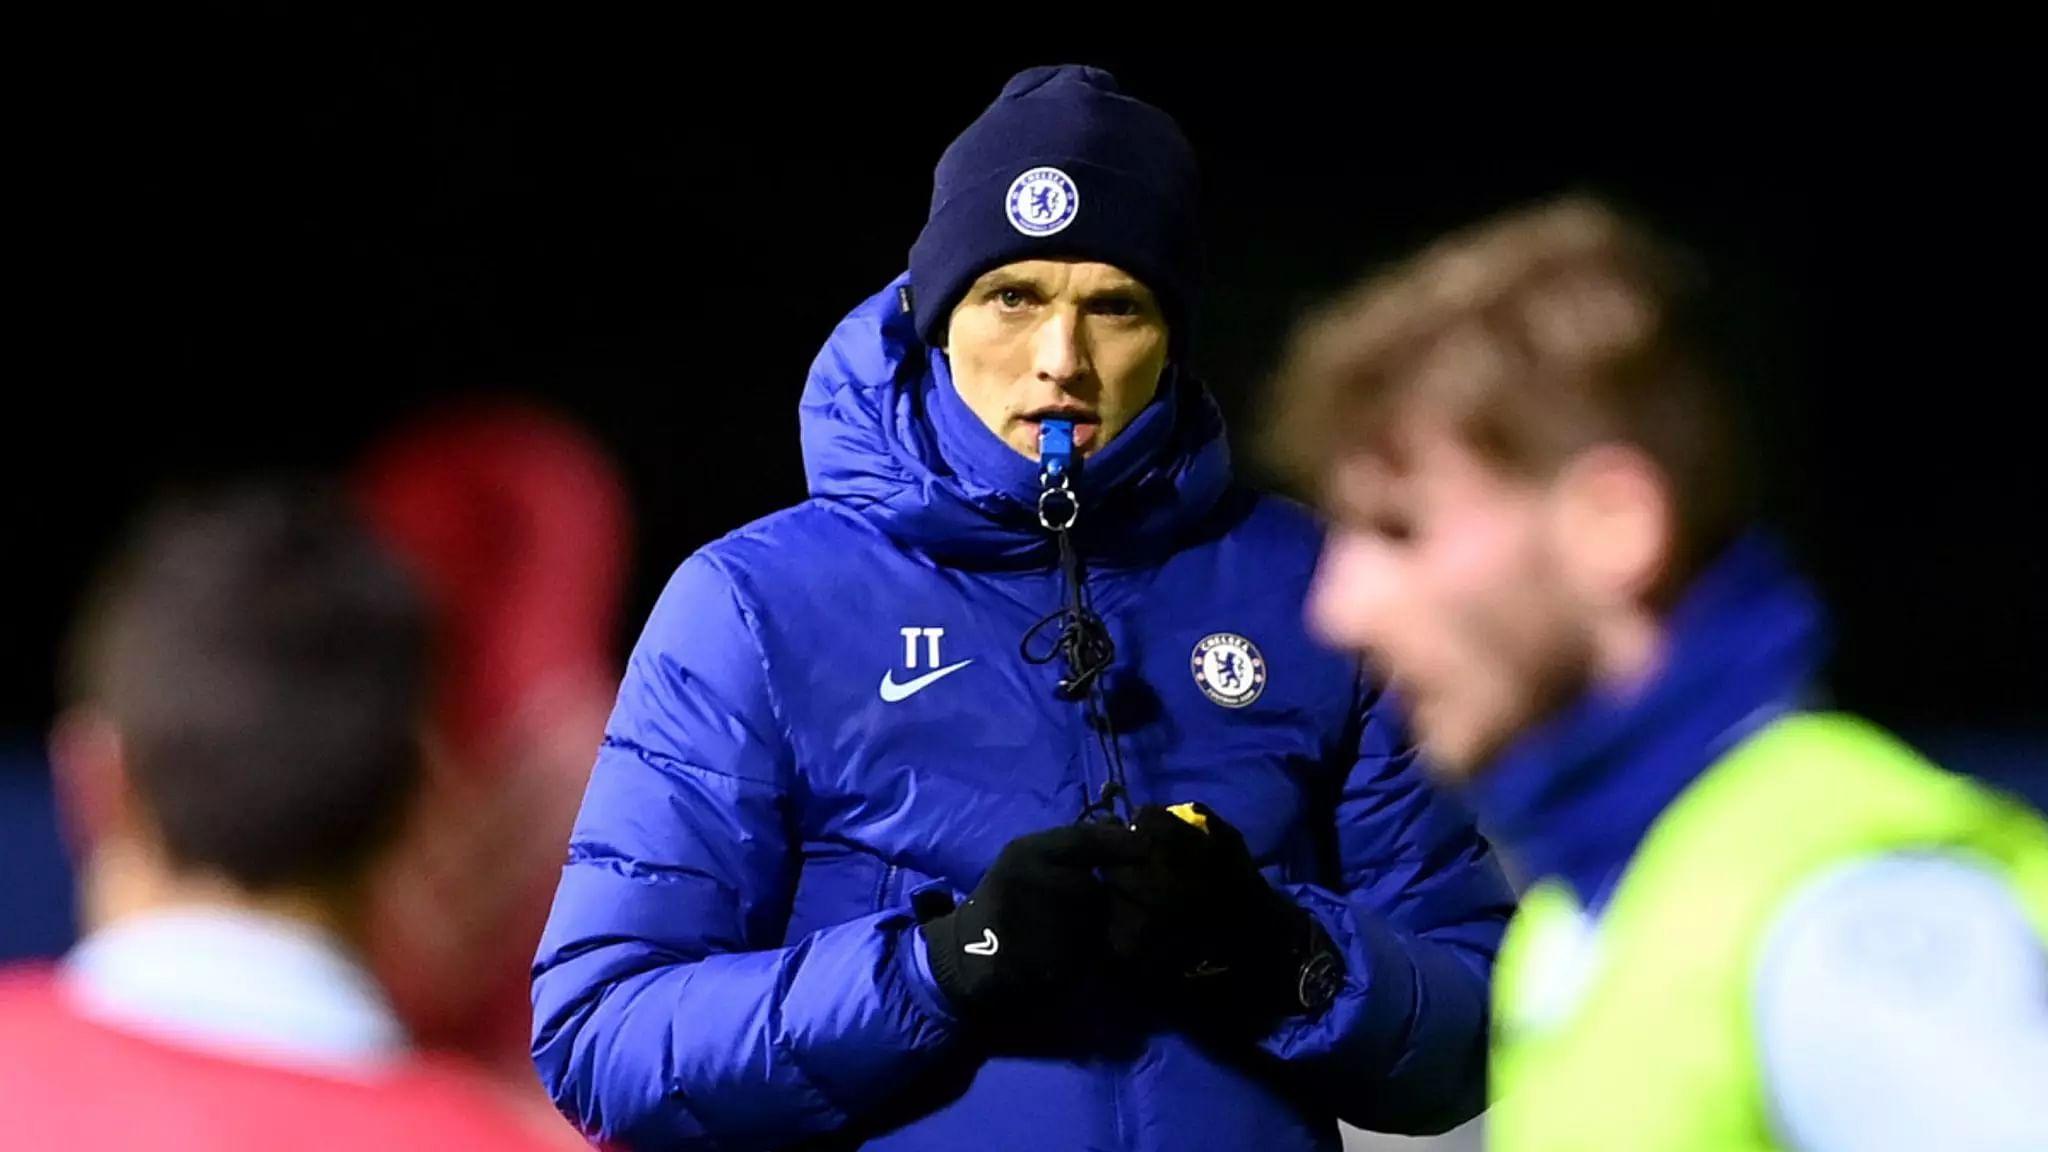 Chelsea appoint Thomas Tuchel as new head coach